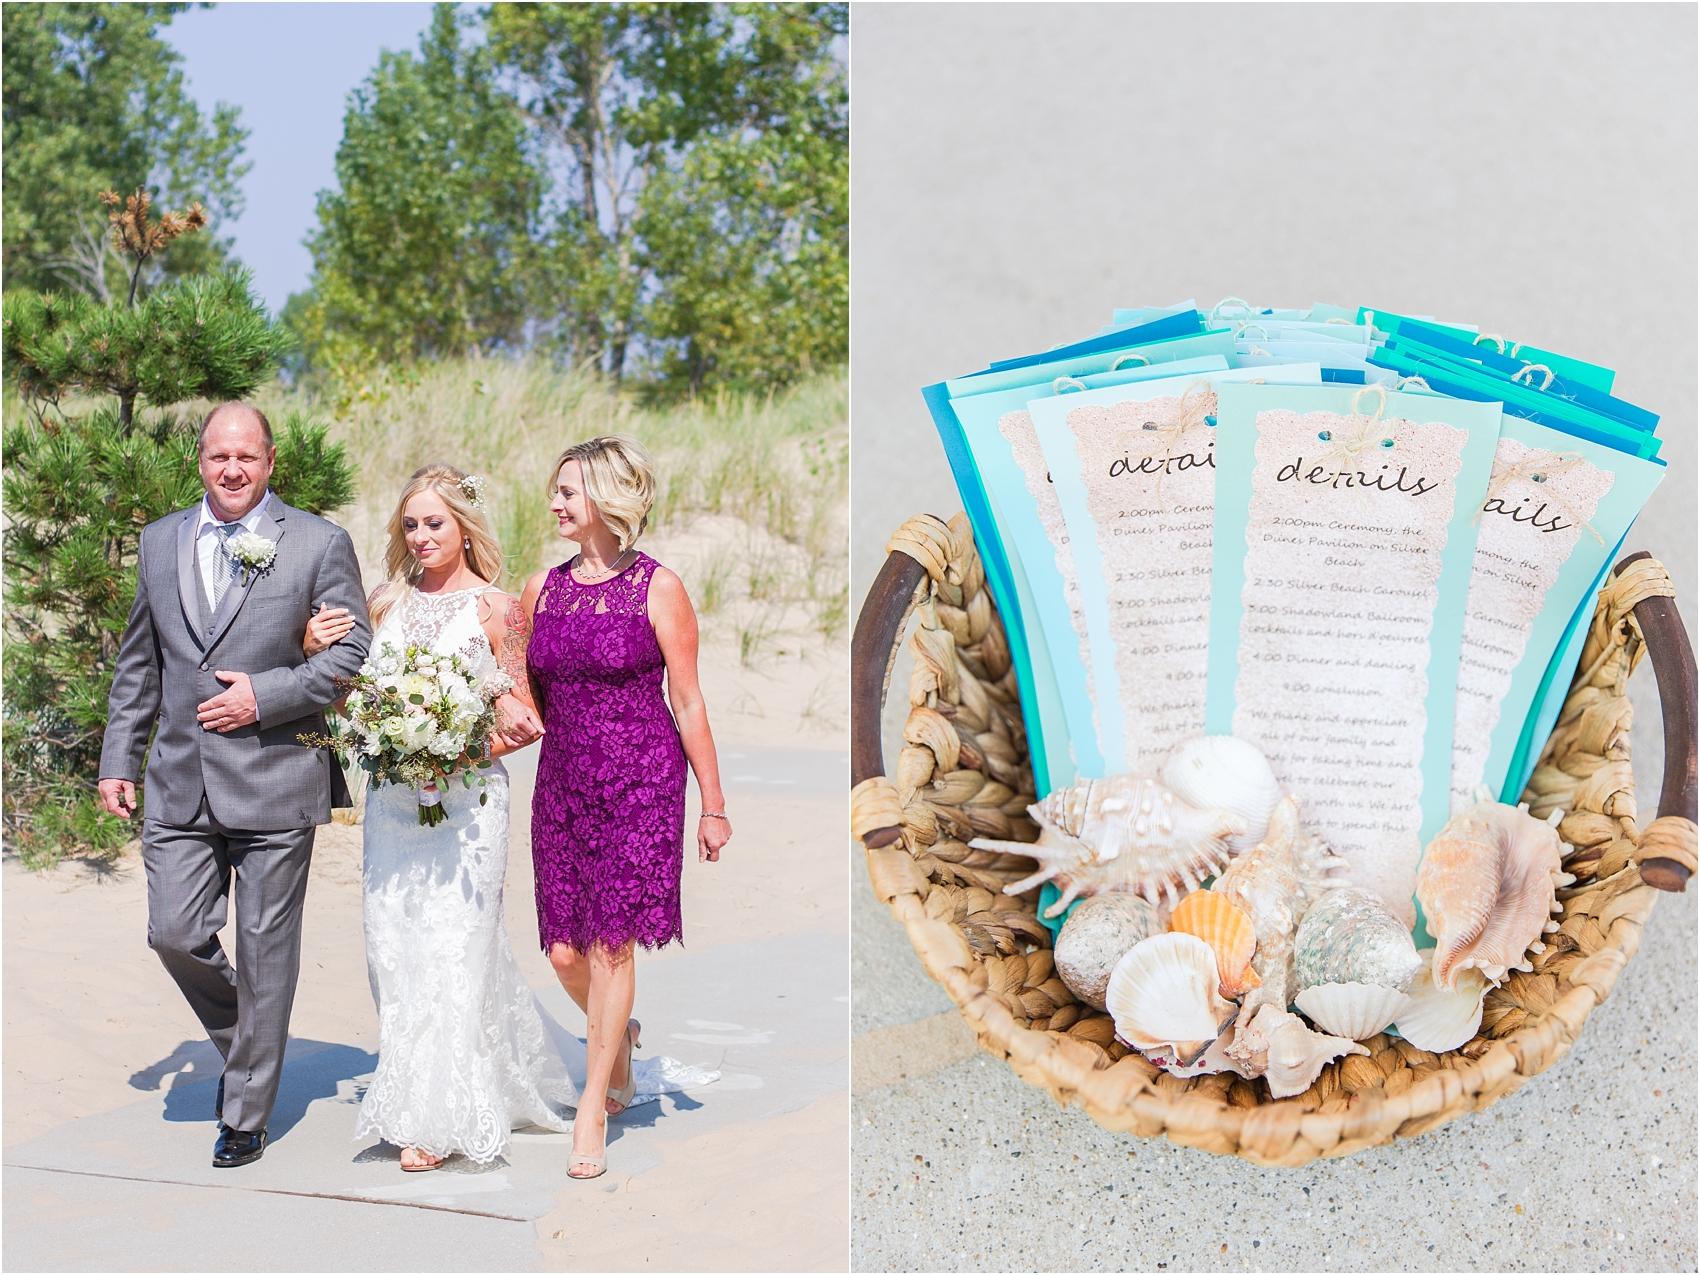 fun-whimsical-beach-wedding-photos-in-st-joseph-michigan-by-courtney-carolyn-photography_0063.jpg